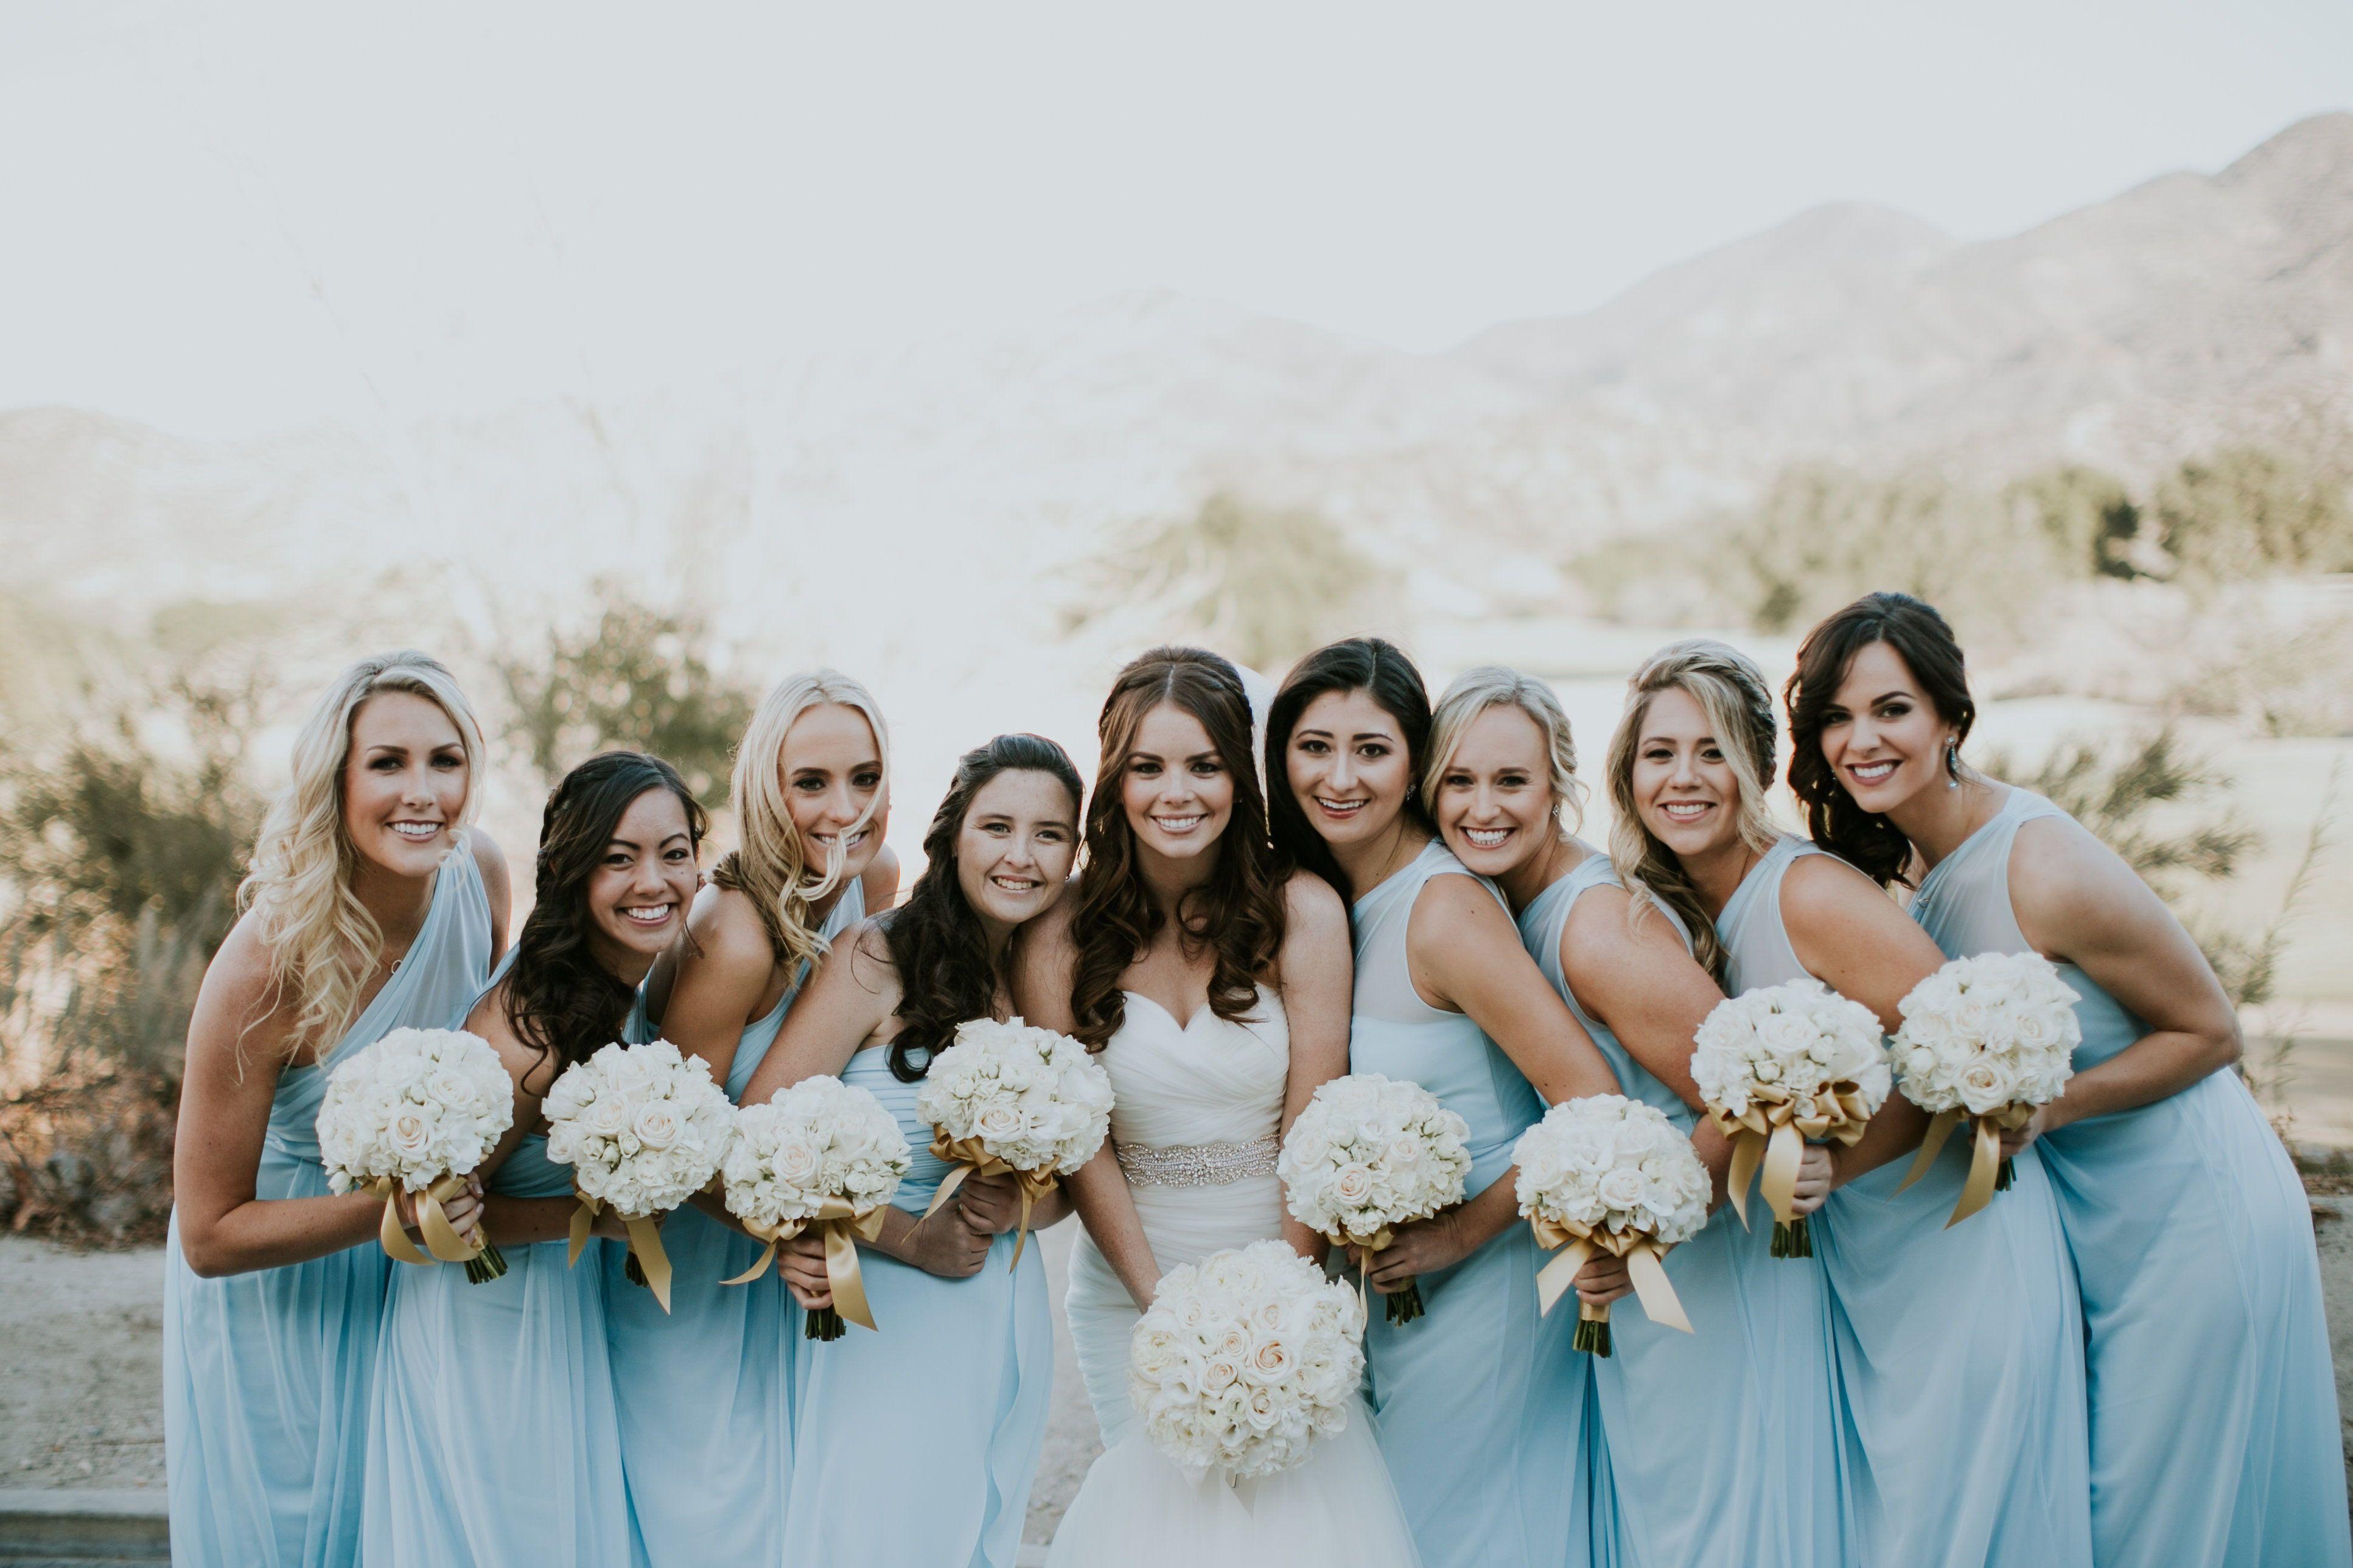 Bridesmaids Hair, Bridesmaids Hairstyles, Bridesmaids Hair